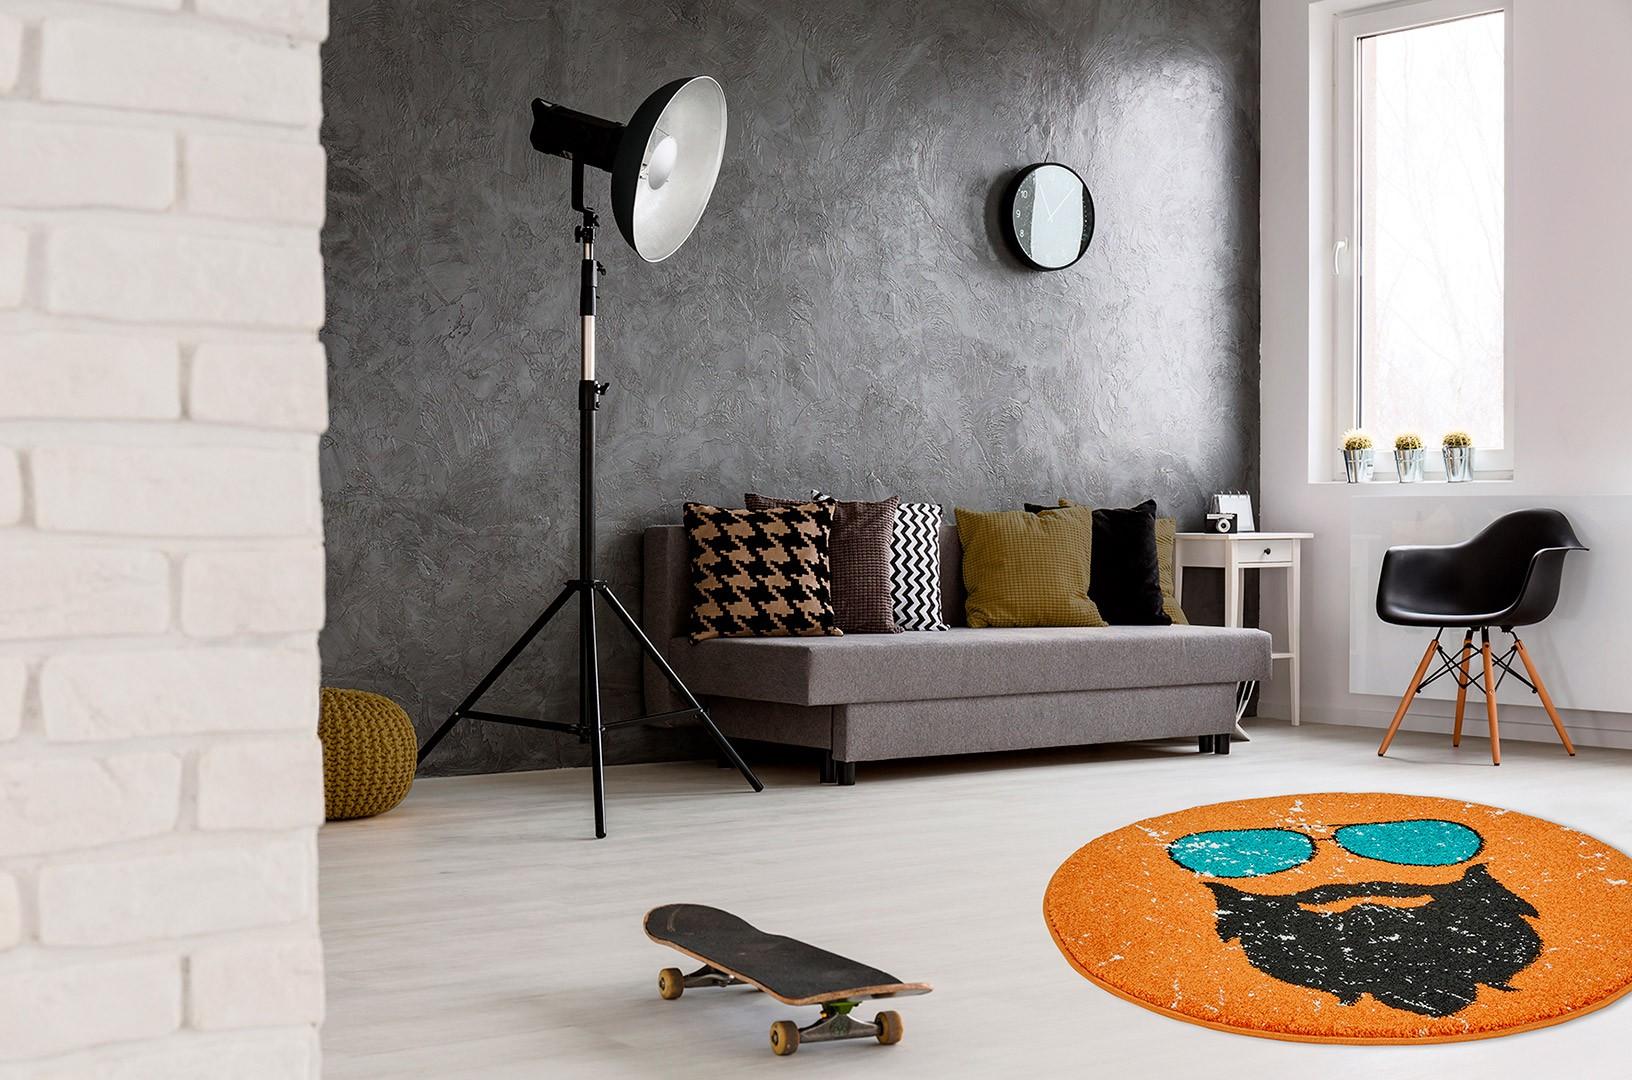 Petit tapis rond orange tendance hipster for Petit tapis rond